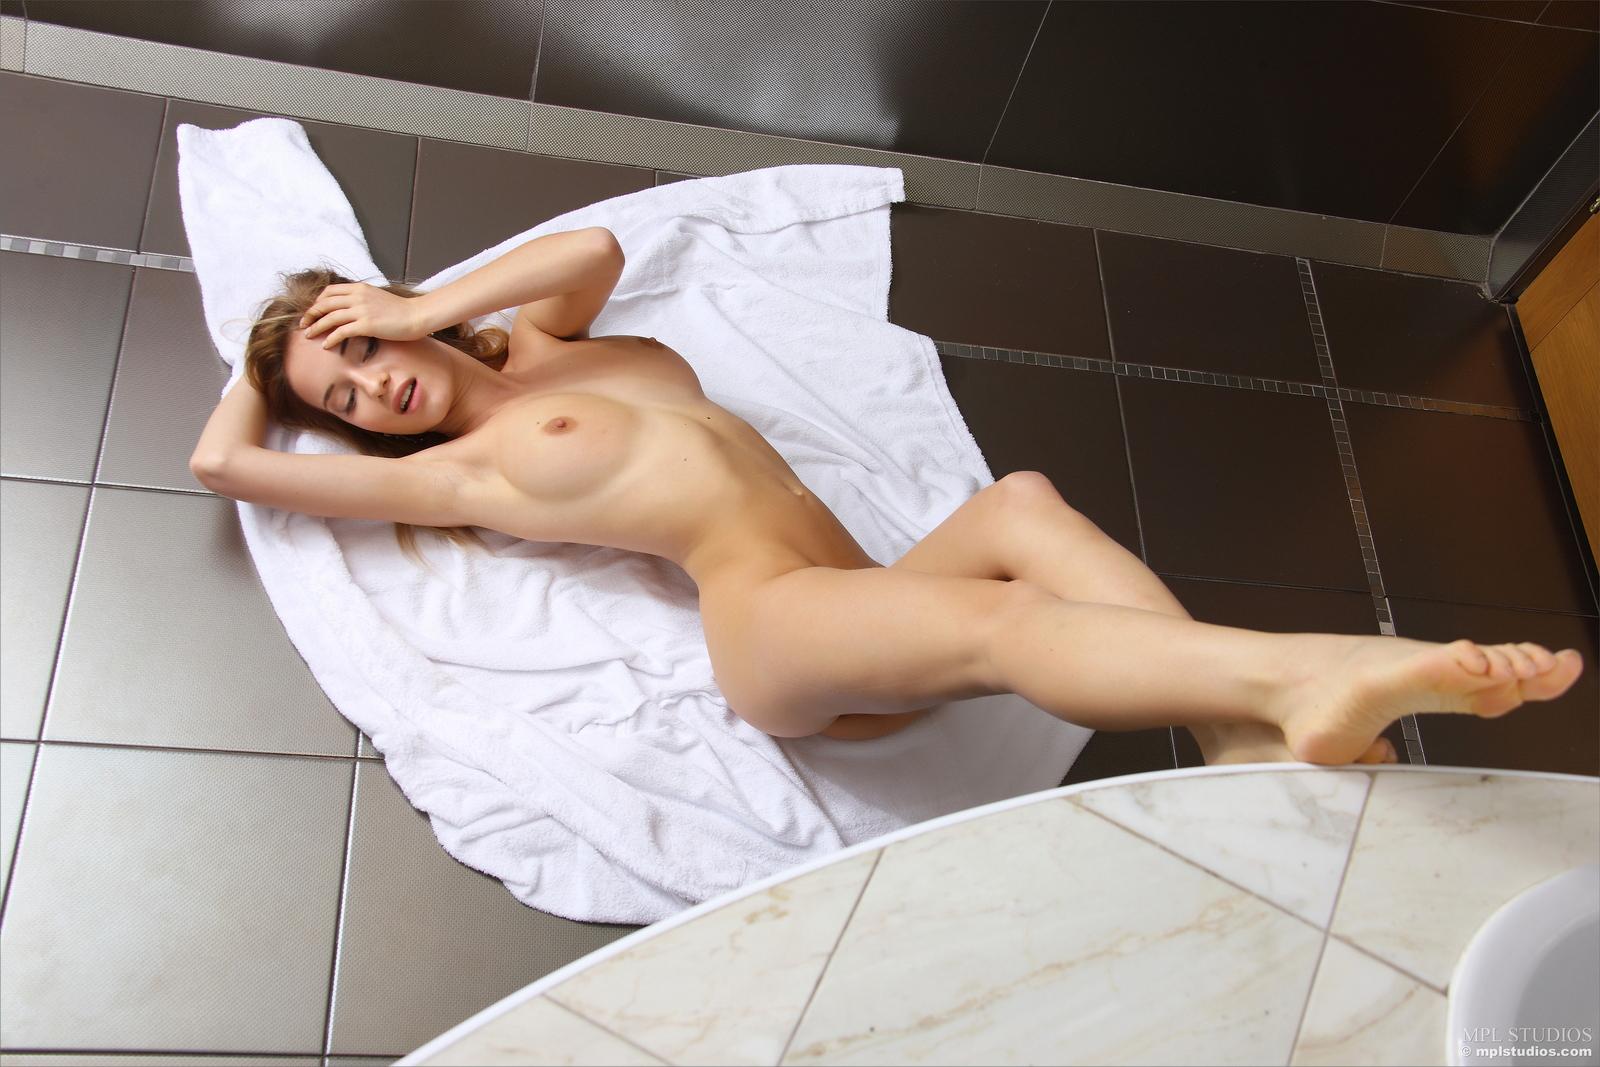 danica-bathroom-blonde-dressing-gown-naked-mplstudios-34